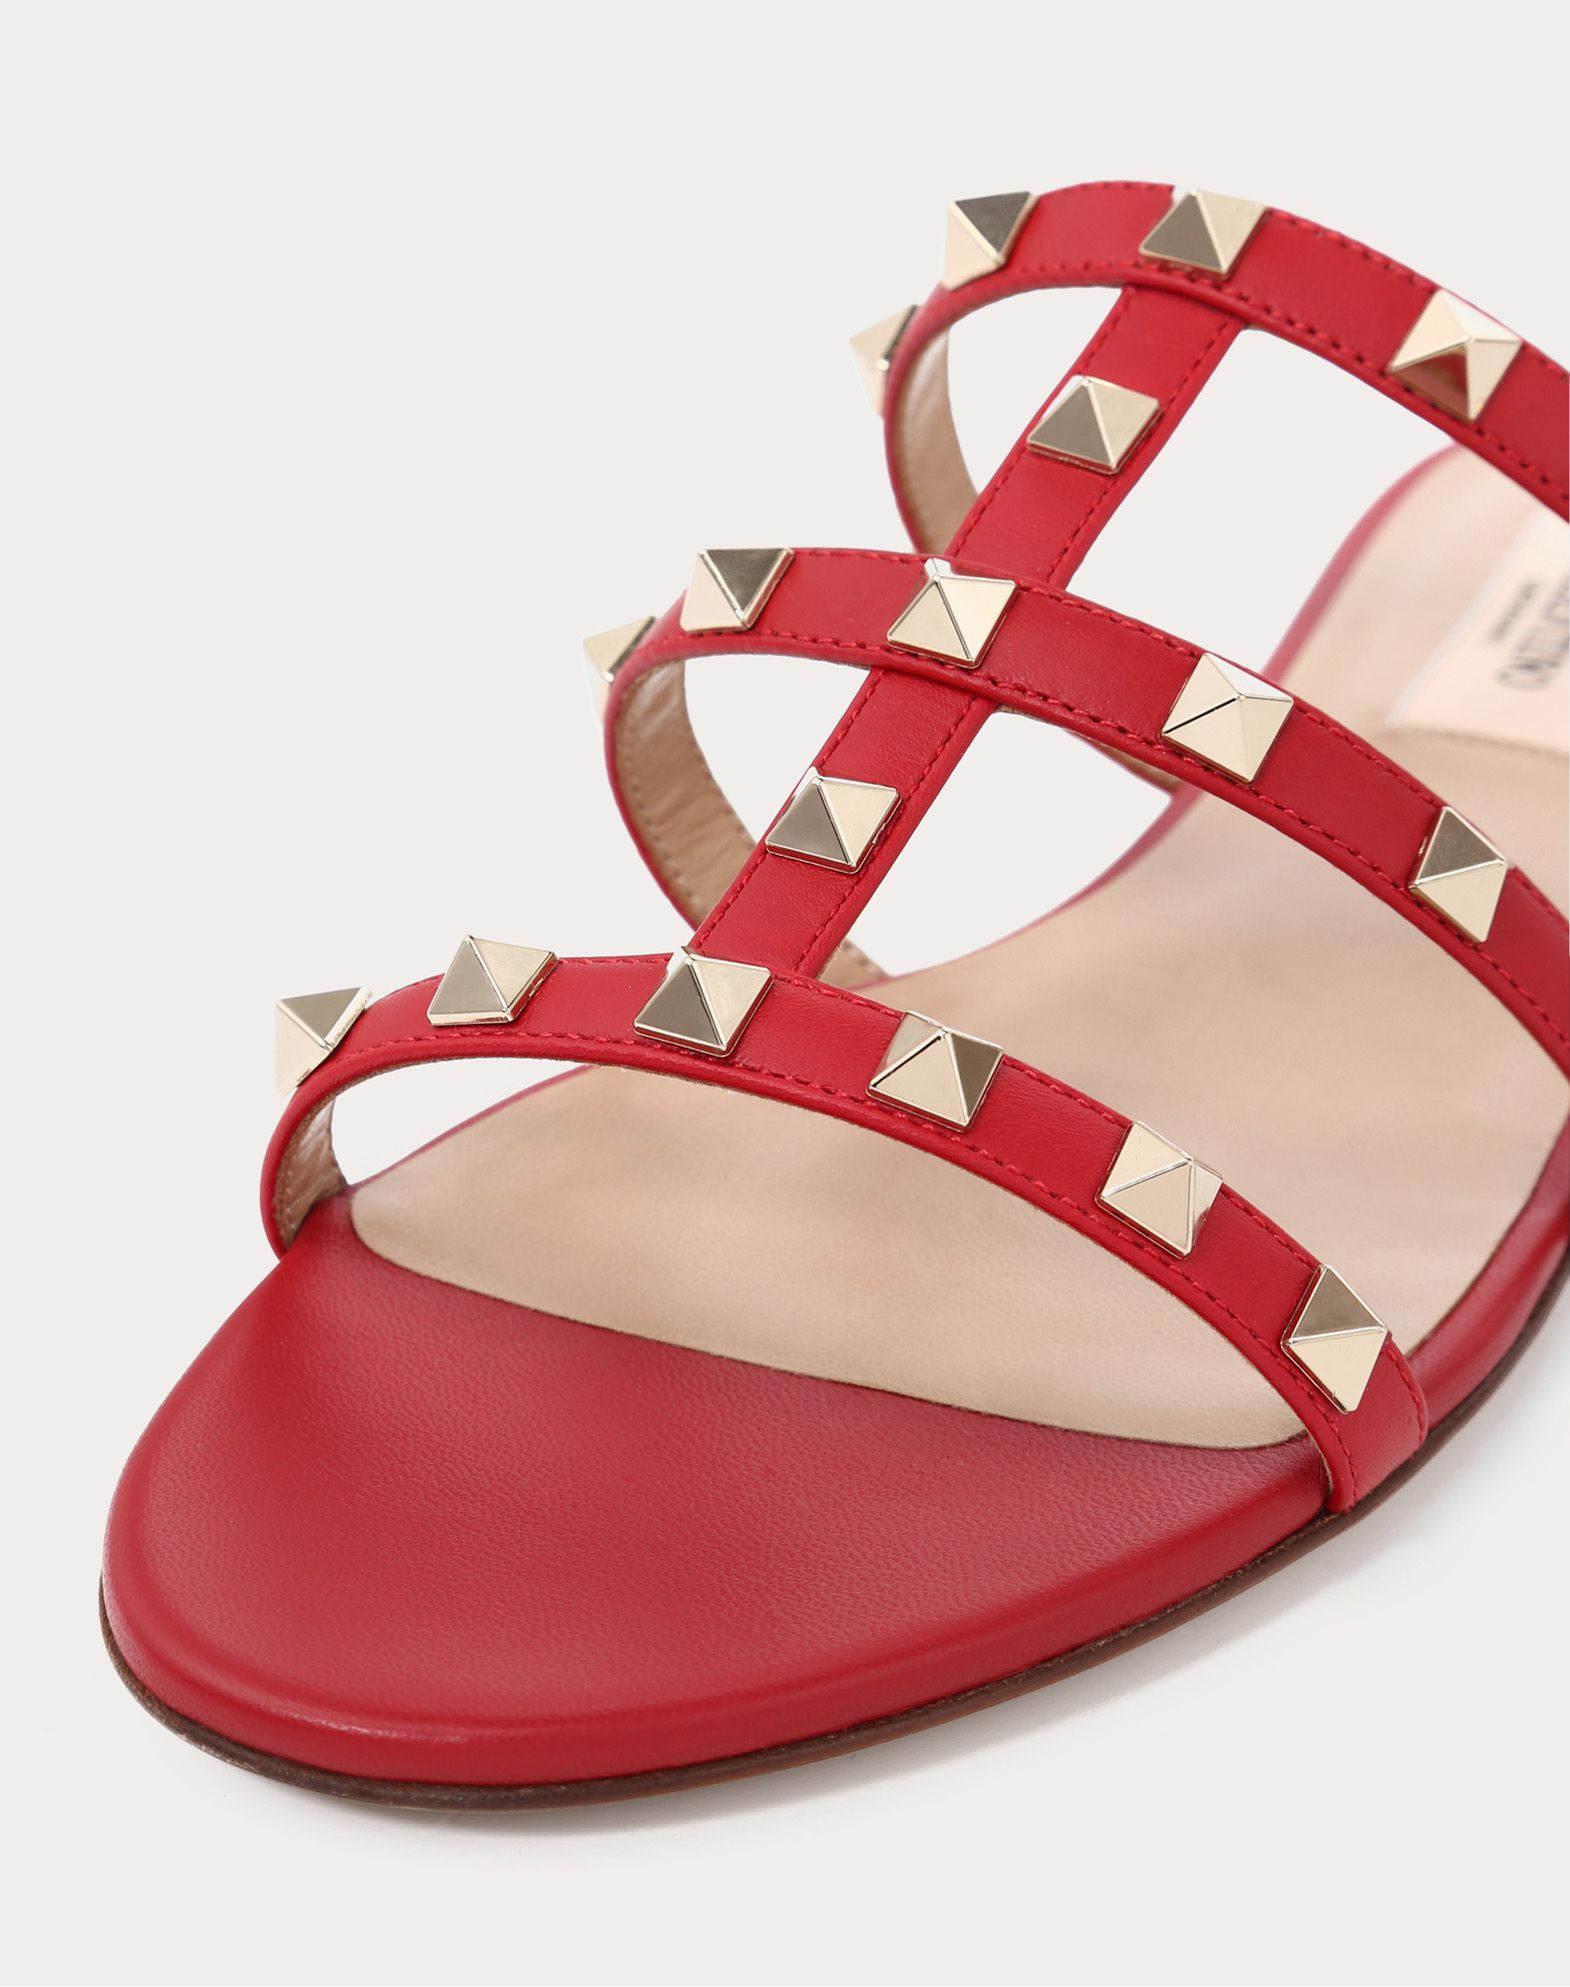 VALENTINO GARAVANI Rockstud Slide Sandal SLIDE SANDAL D a